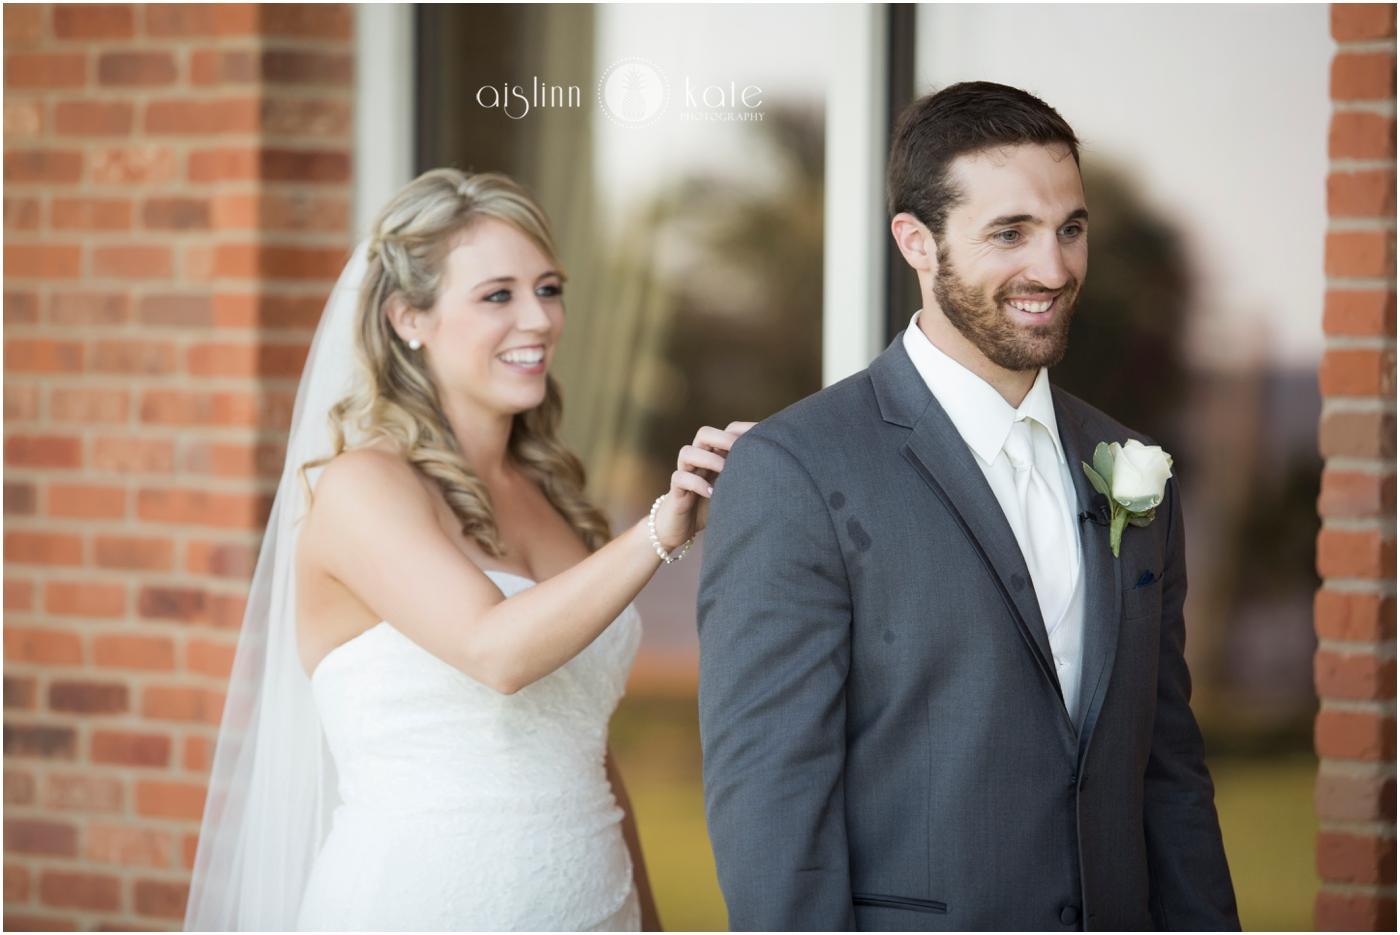 Pensacola-Destin-Wedding-Photographer_5632.jpg